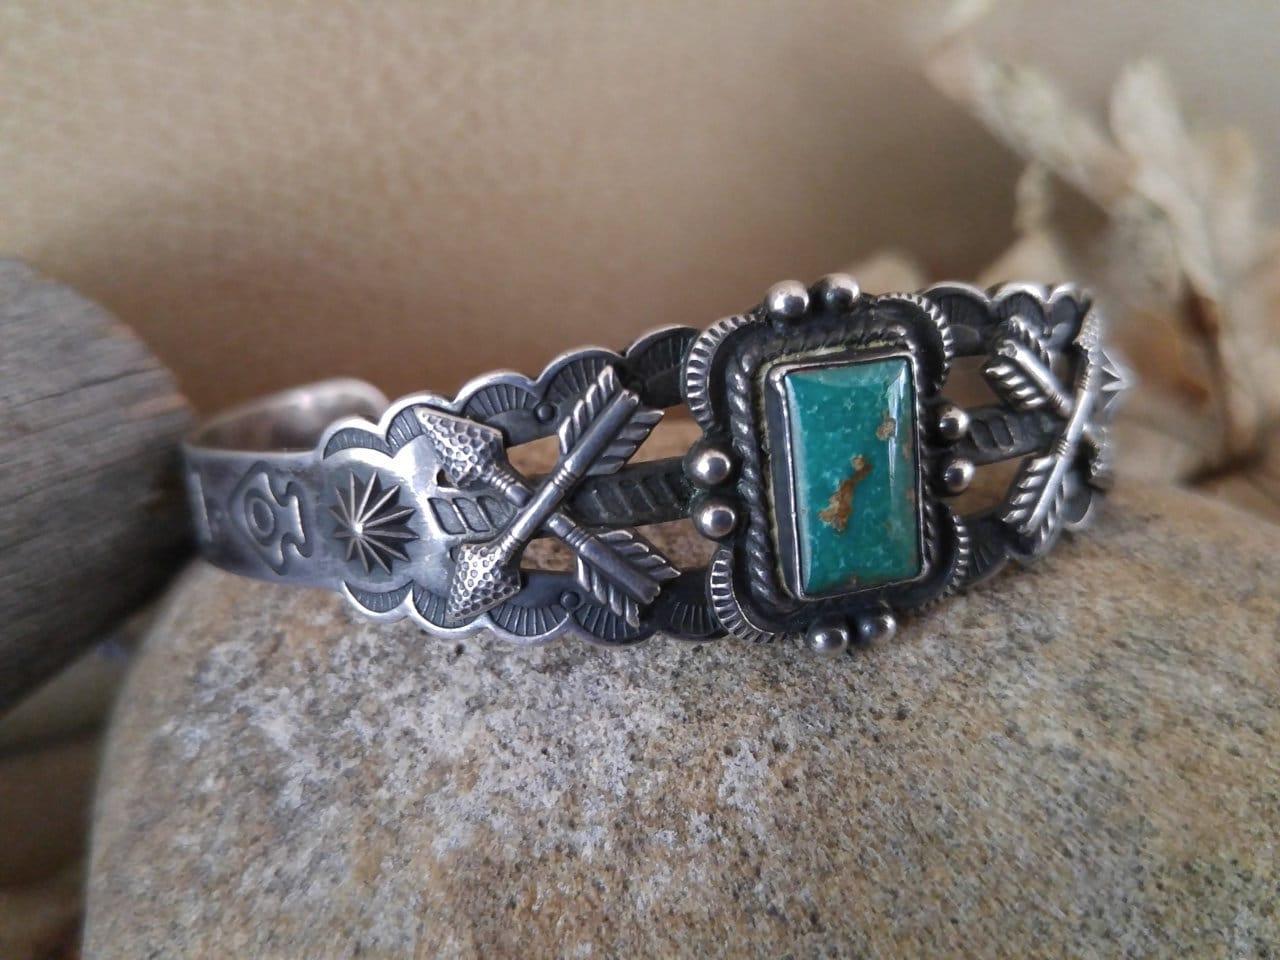 Size 5.75-788575701 Wonderful Vintage Native Style Blue Turquoise Southwestern Sterling Silver Wrap Adjustable Ring